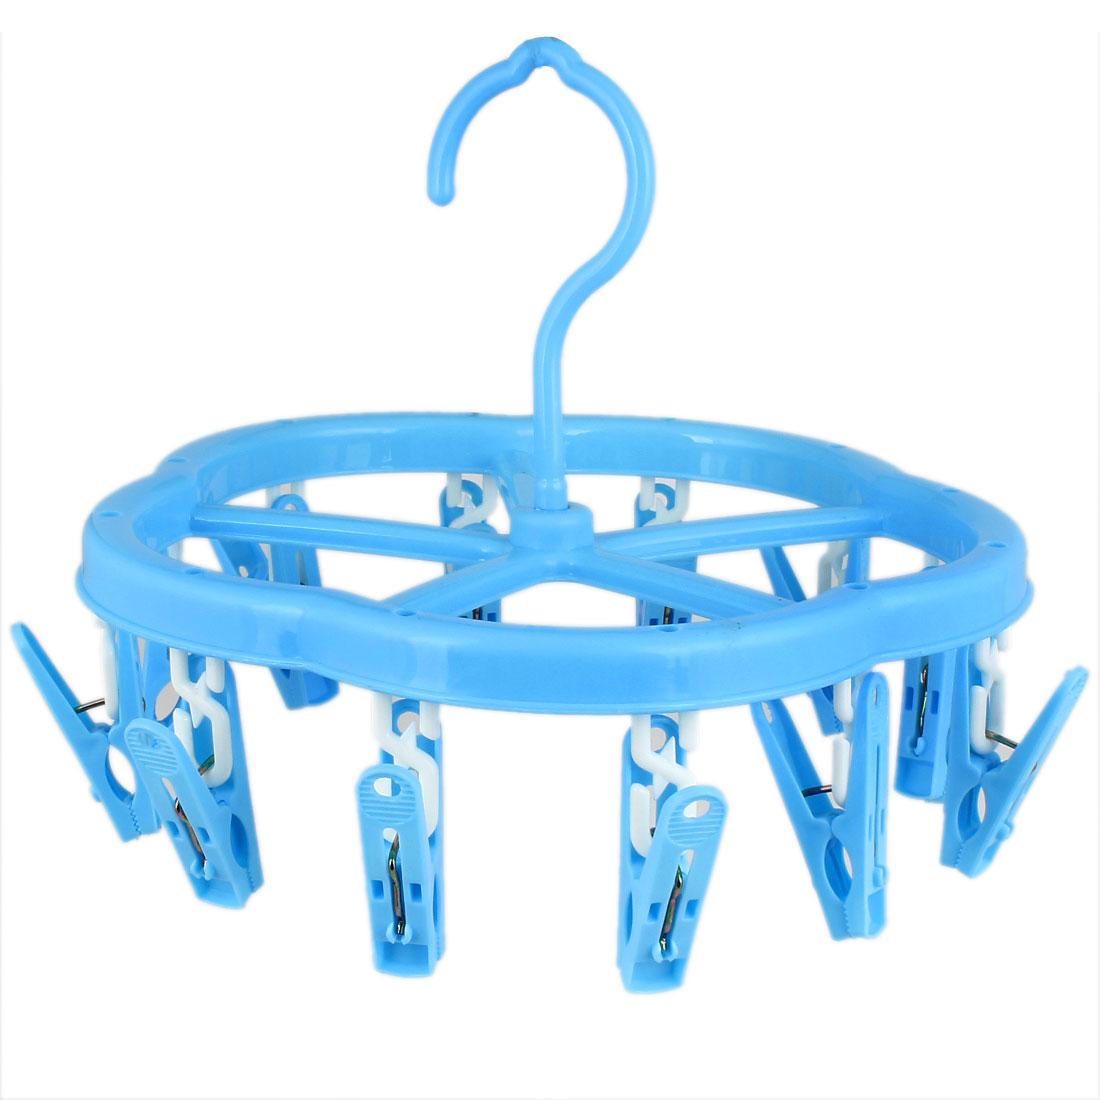 Plastic 12 Clothespins Underwear Shoelace Socks Towel Clothes Hanger Blue